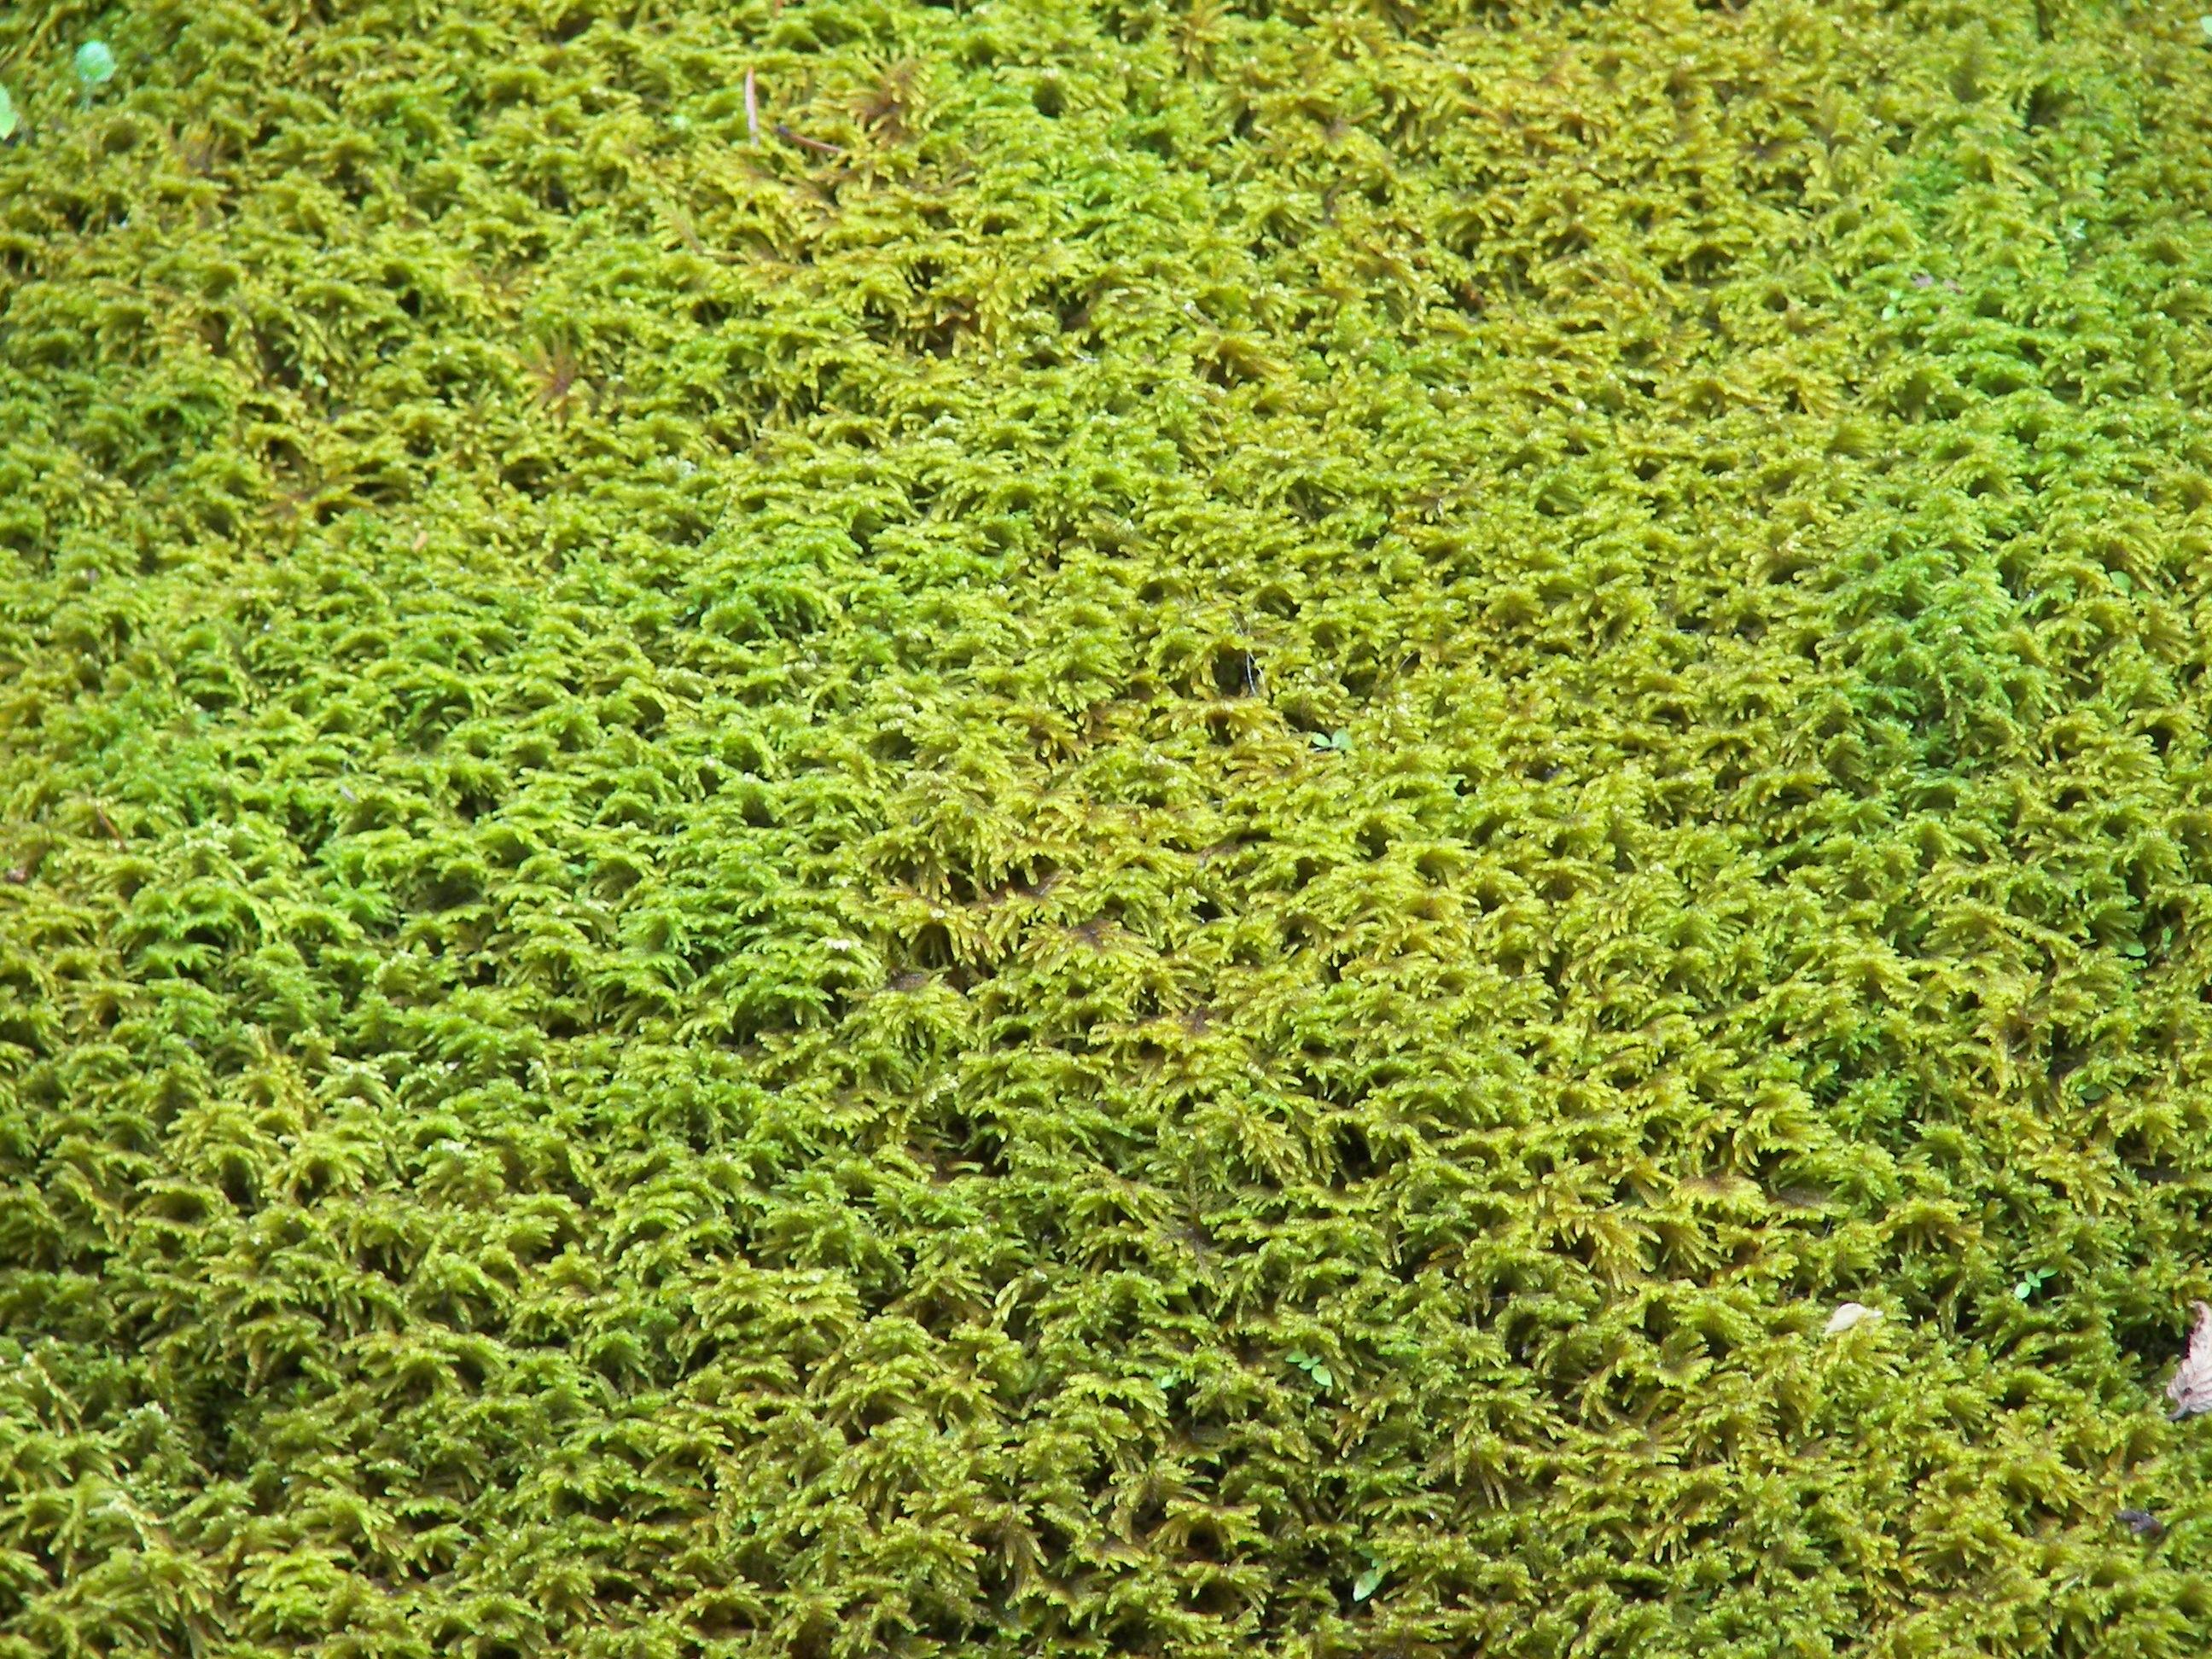 Plante gazon cheap vente chaude mur vert herbe en for Arbuste plastique